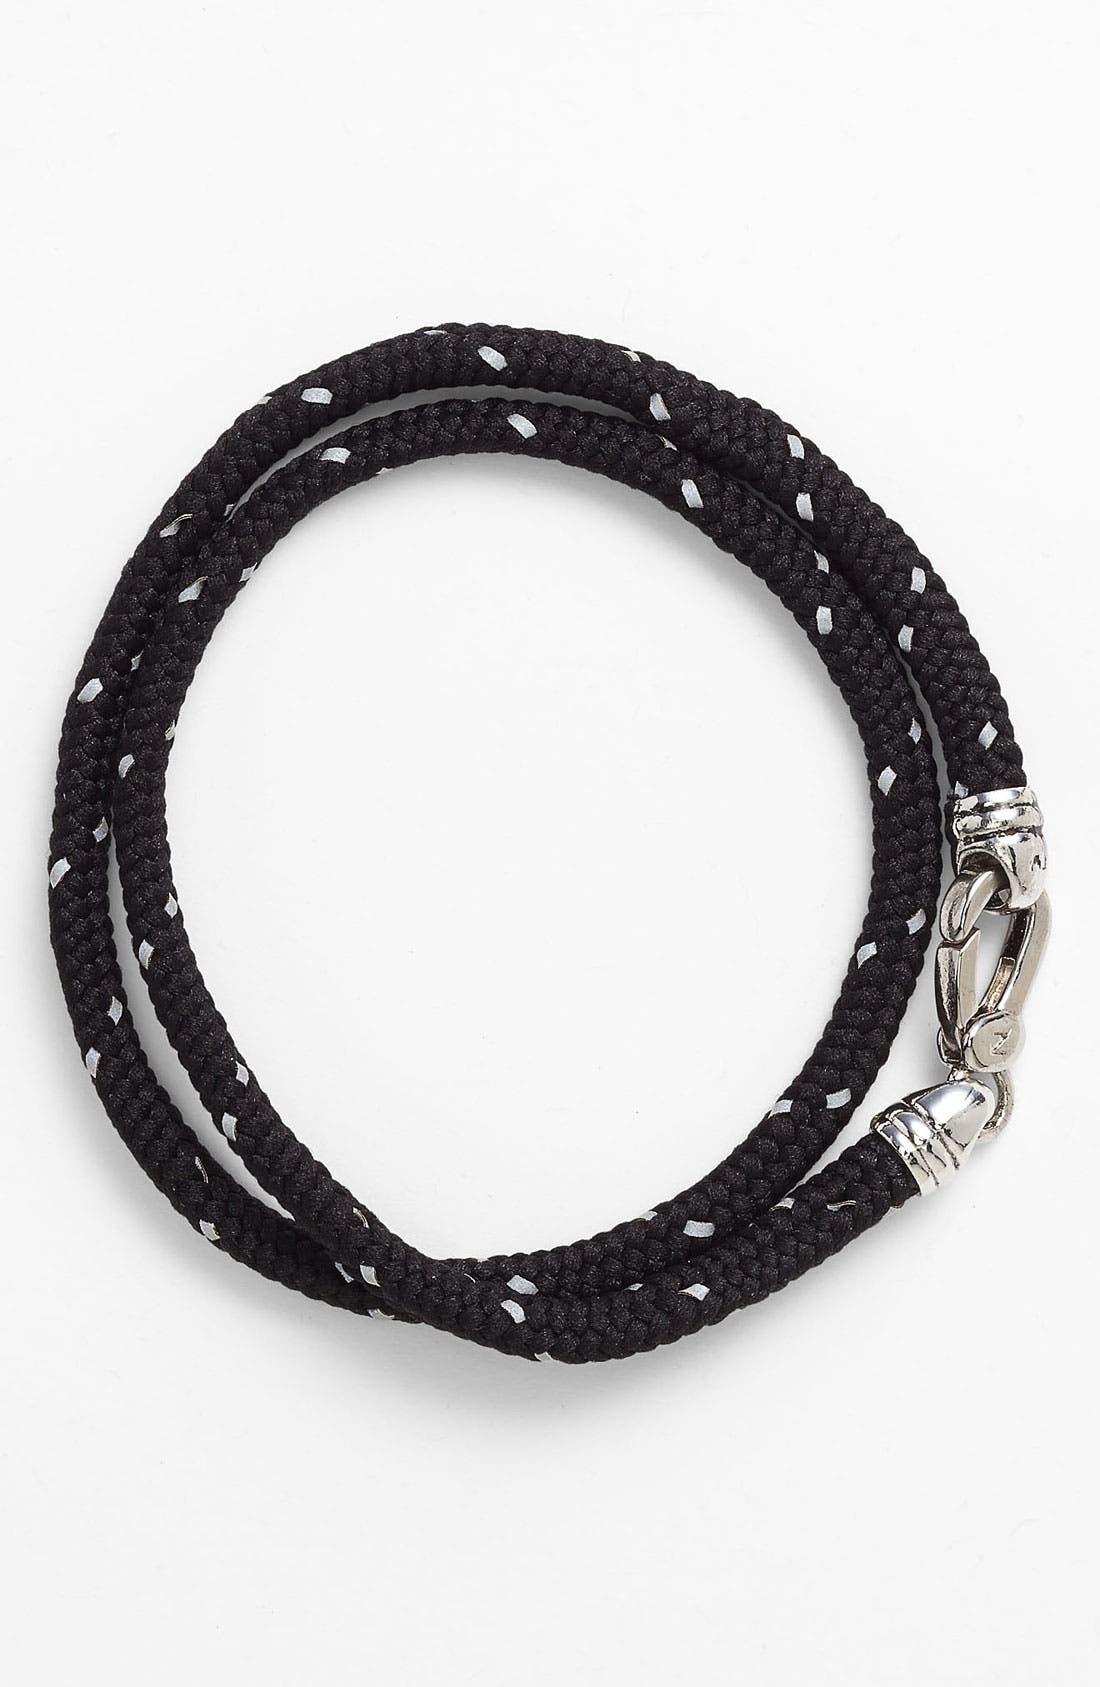 Alternate Image 1 Selected - Zack Wrap Cord Bracelet